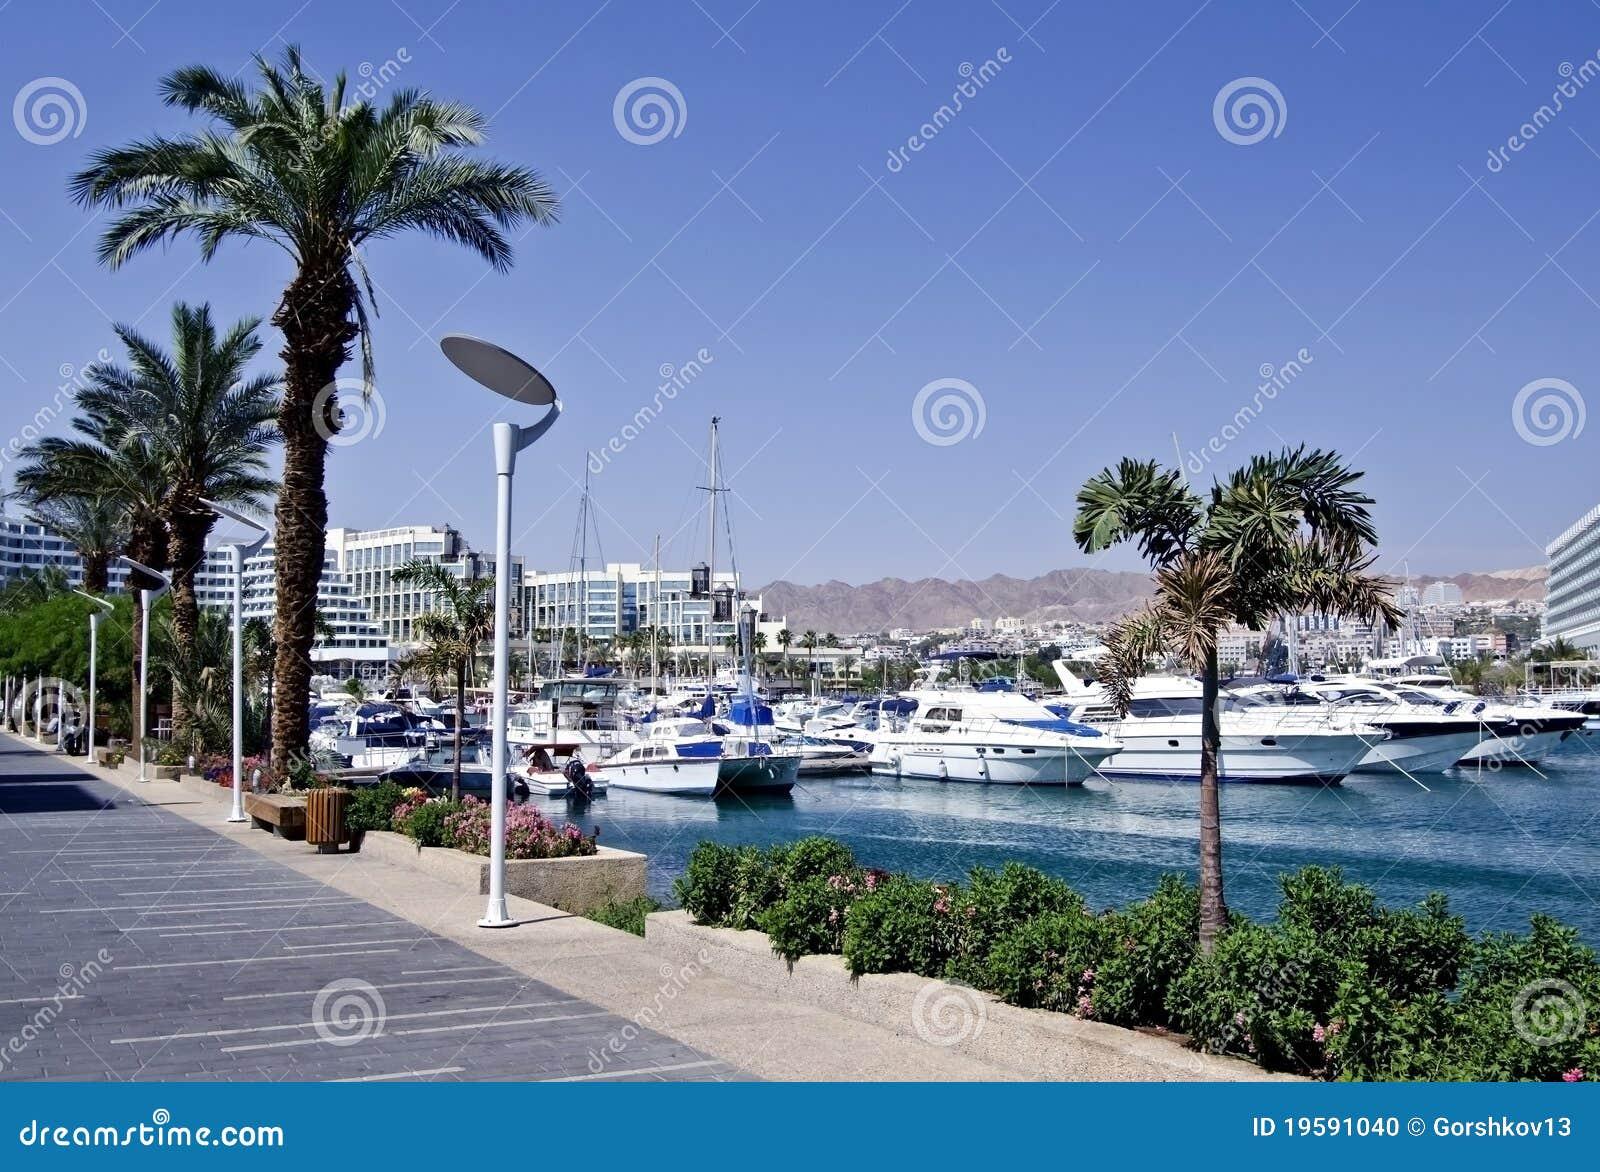 Zonnige dag op promenade van Eilat stad, Israël